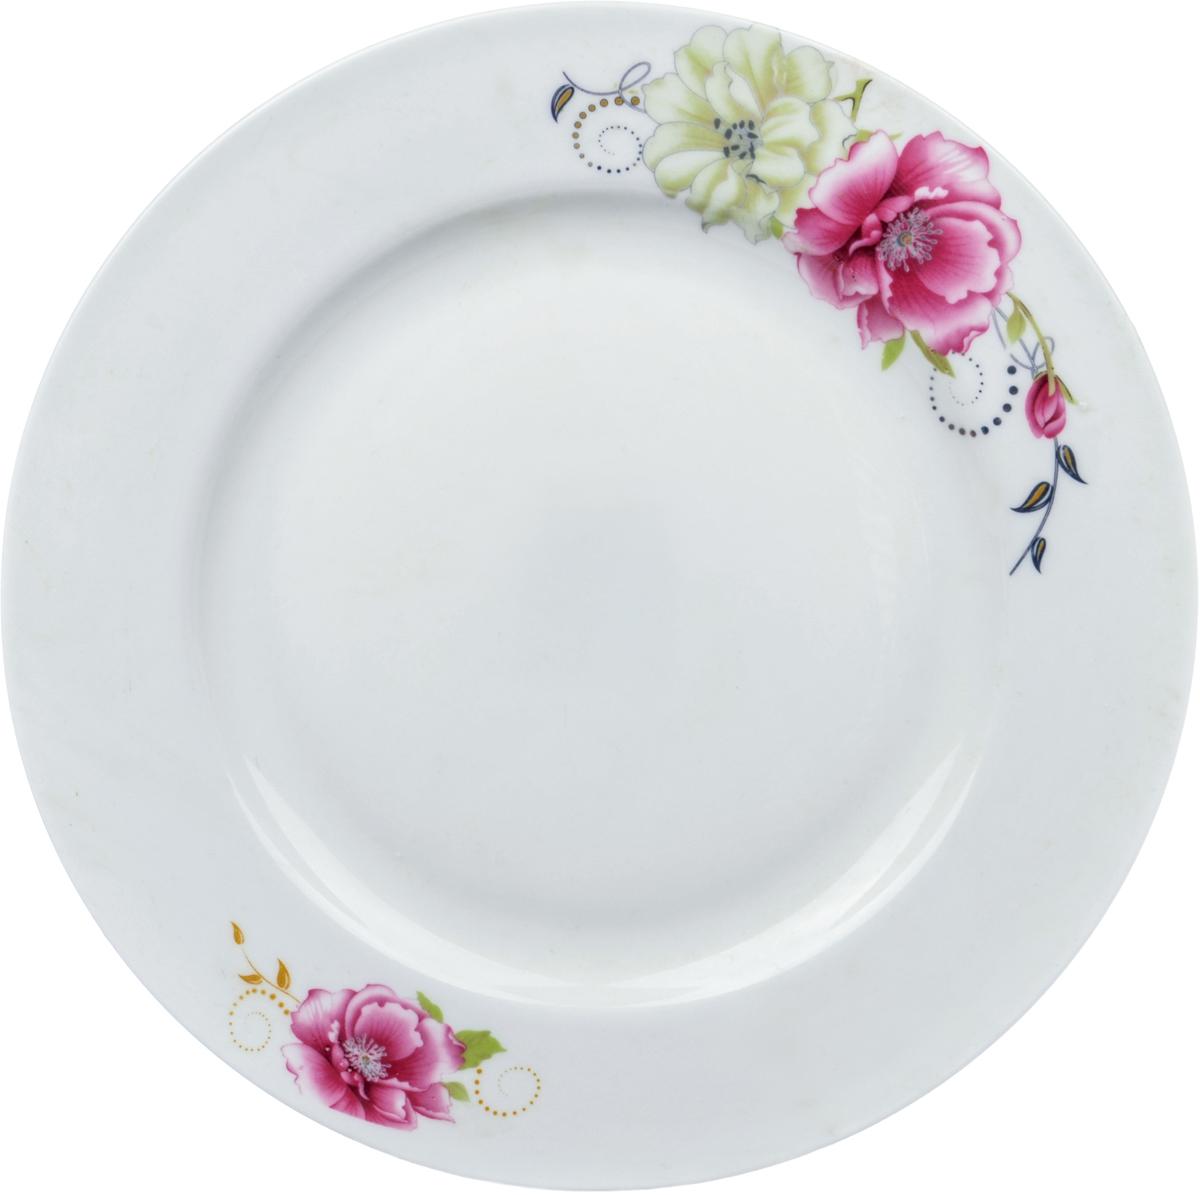 Тарелка Ningbo Royal Роза, диаметр 23 см фарфоровая посуда дулево на авито